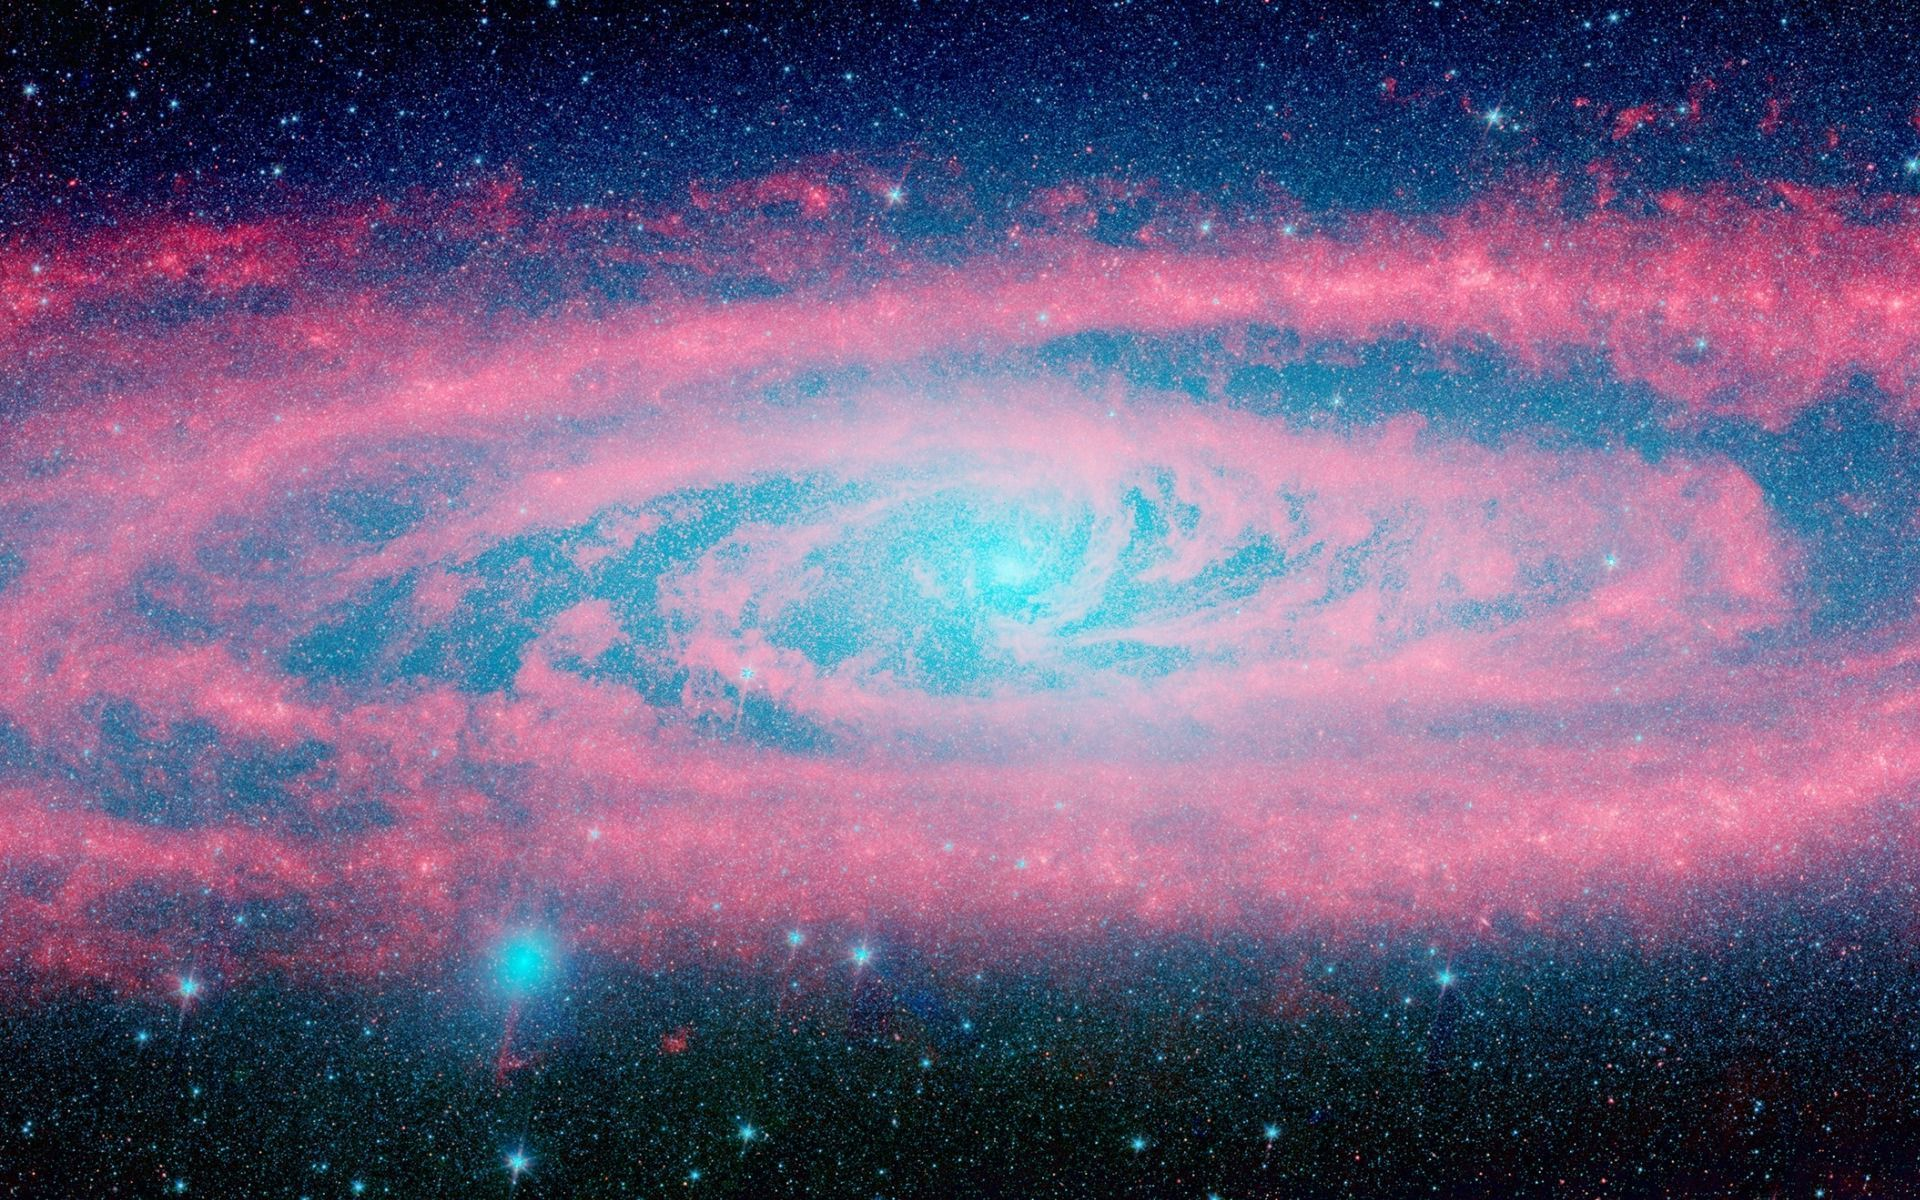 Desktop Wallpaper Tumblr Galaxy Free Download Hd Desktop Wallpapers 1080p Pretty Wallpapers Tumblr Galaxy Phone Wallpaper Galaxy Wallpaper